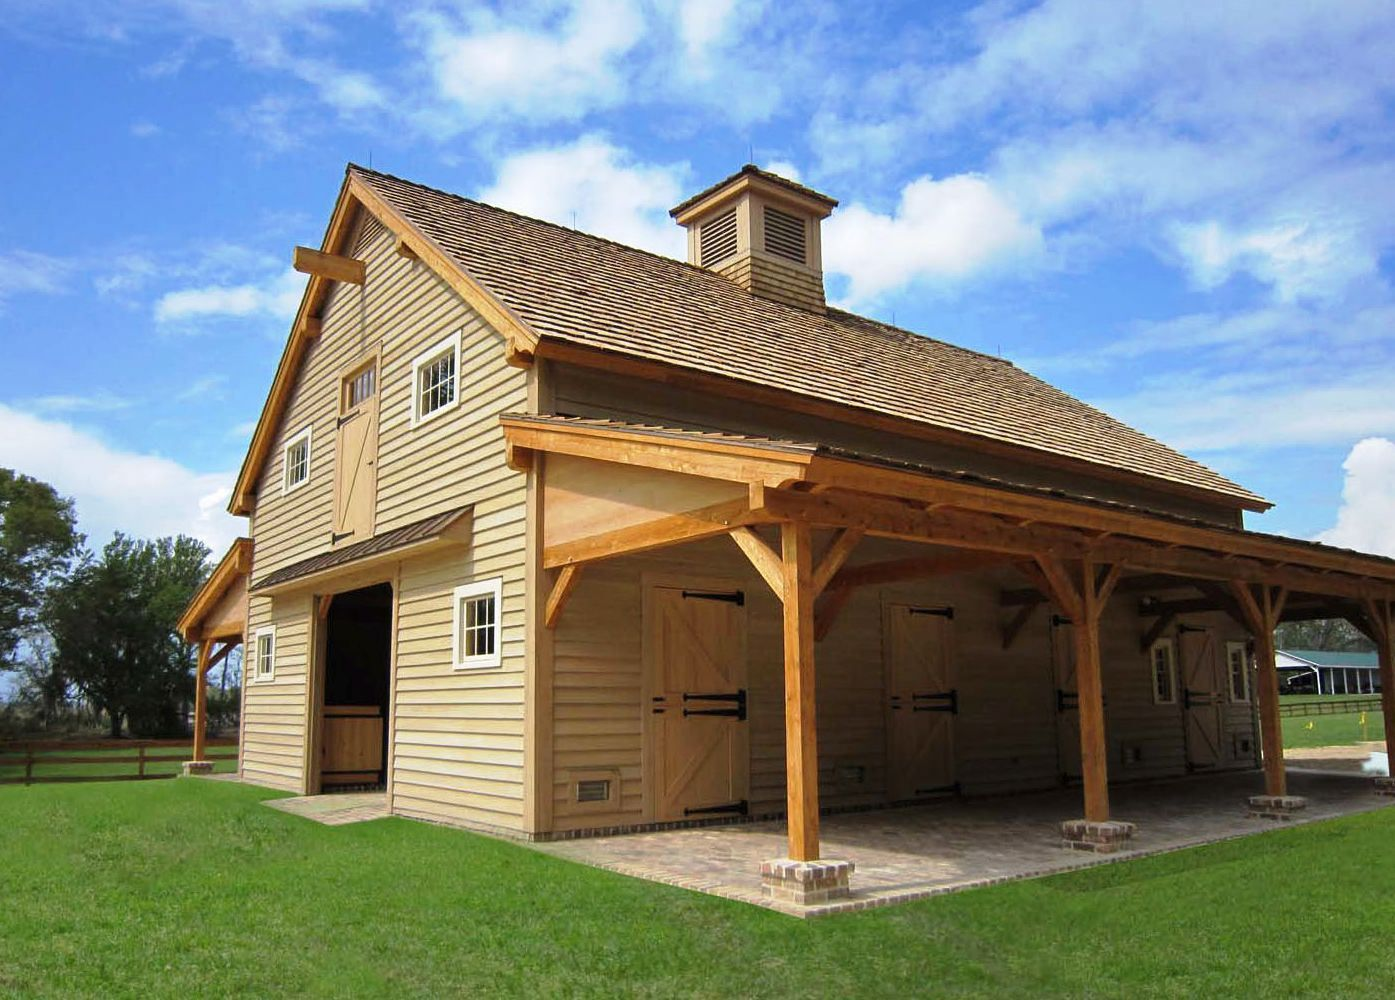 Post And Beam Barn Plans Free Barn House Design Pole Barn Homes Barn Design